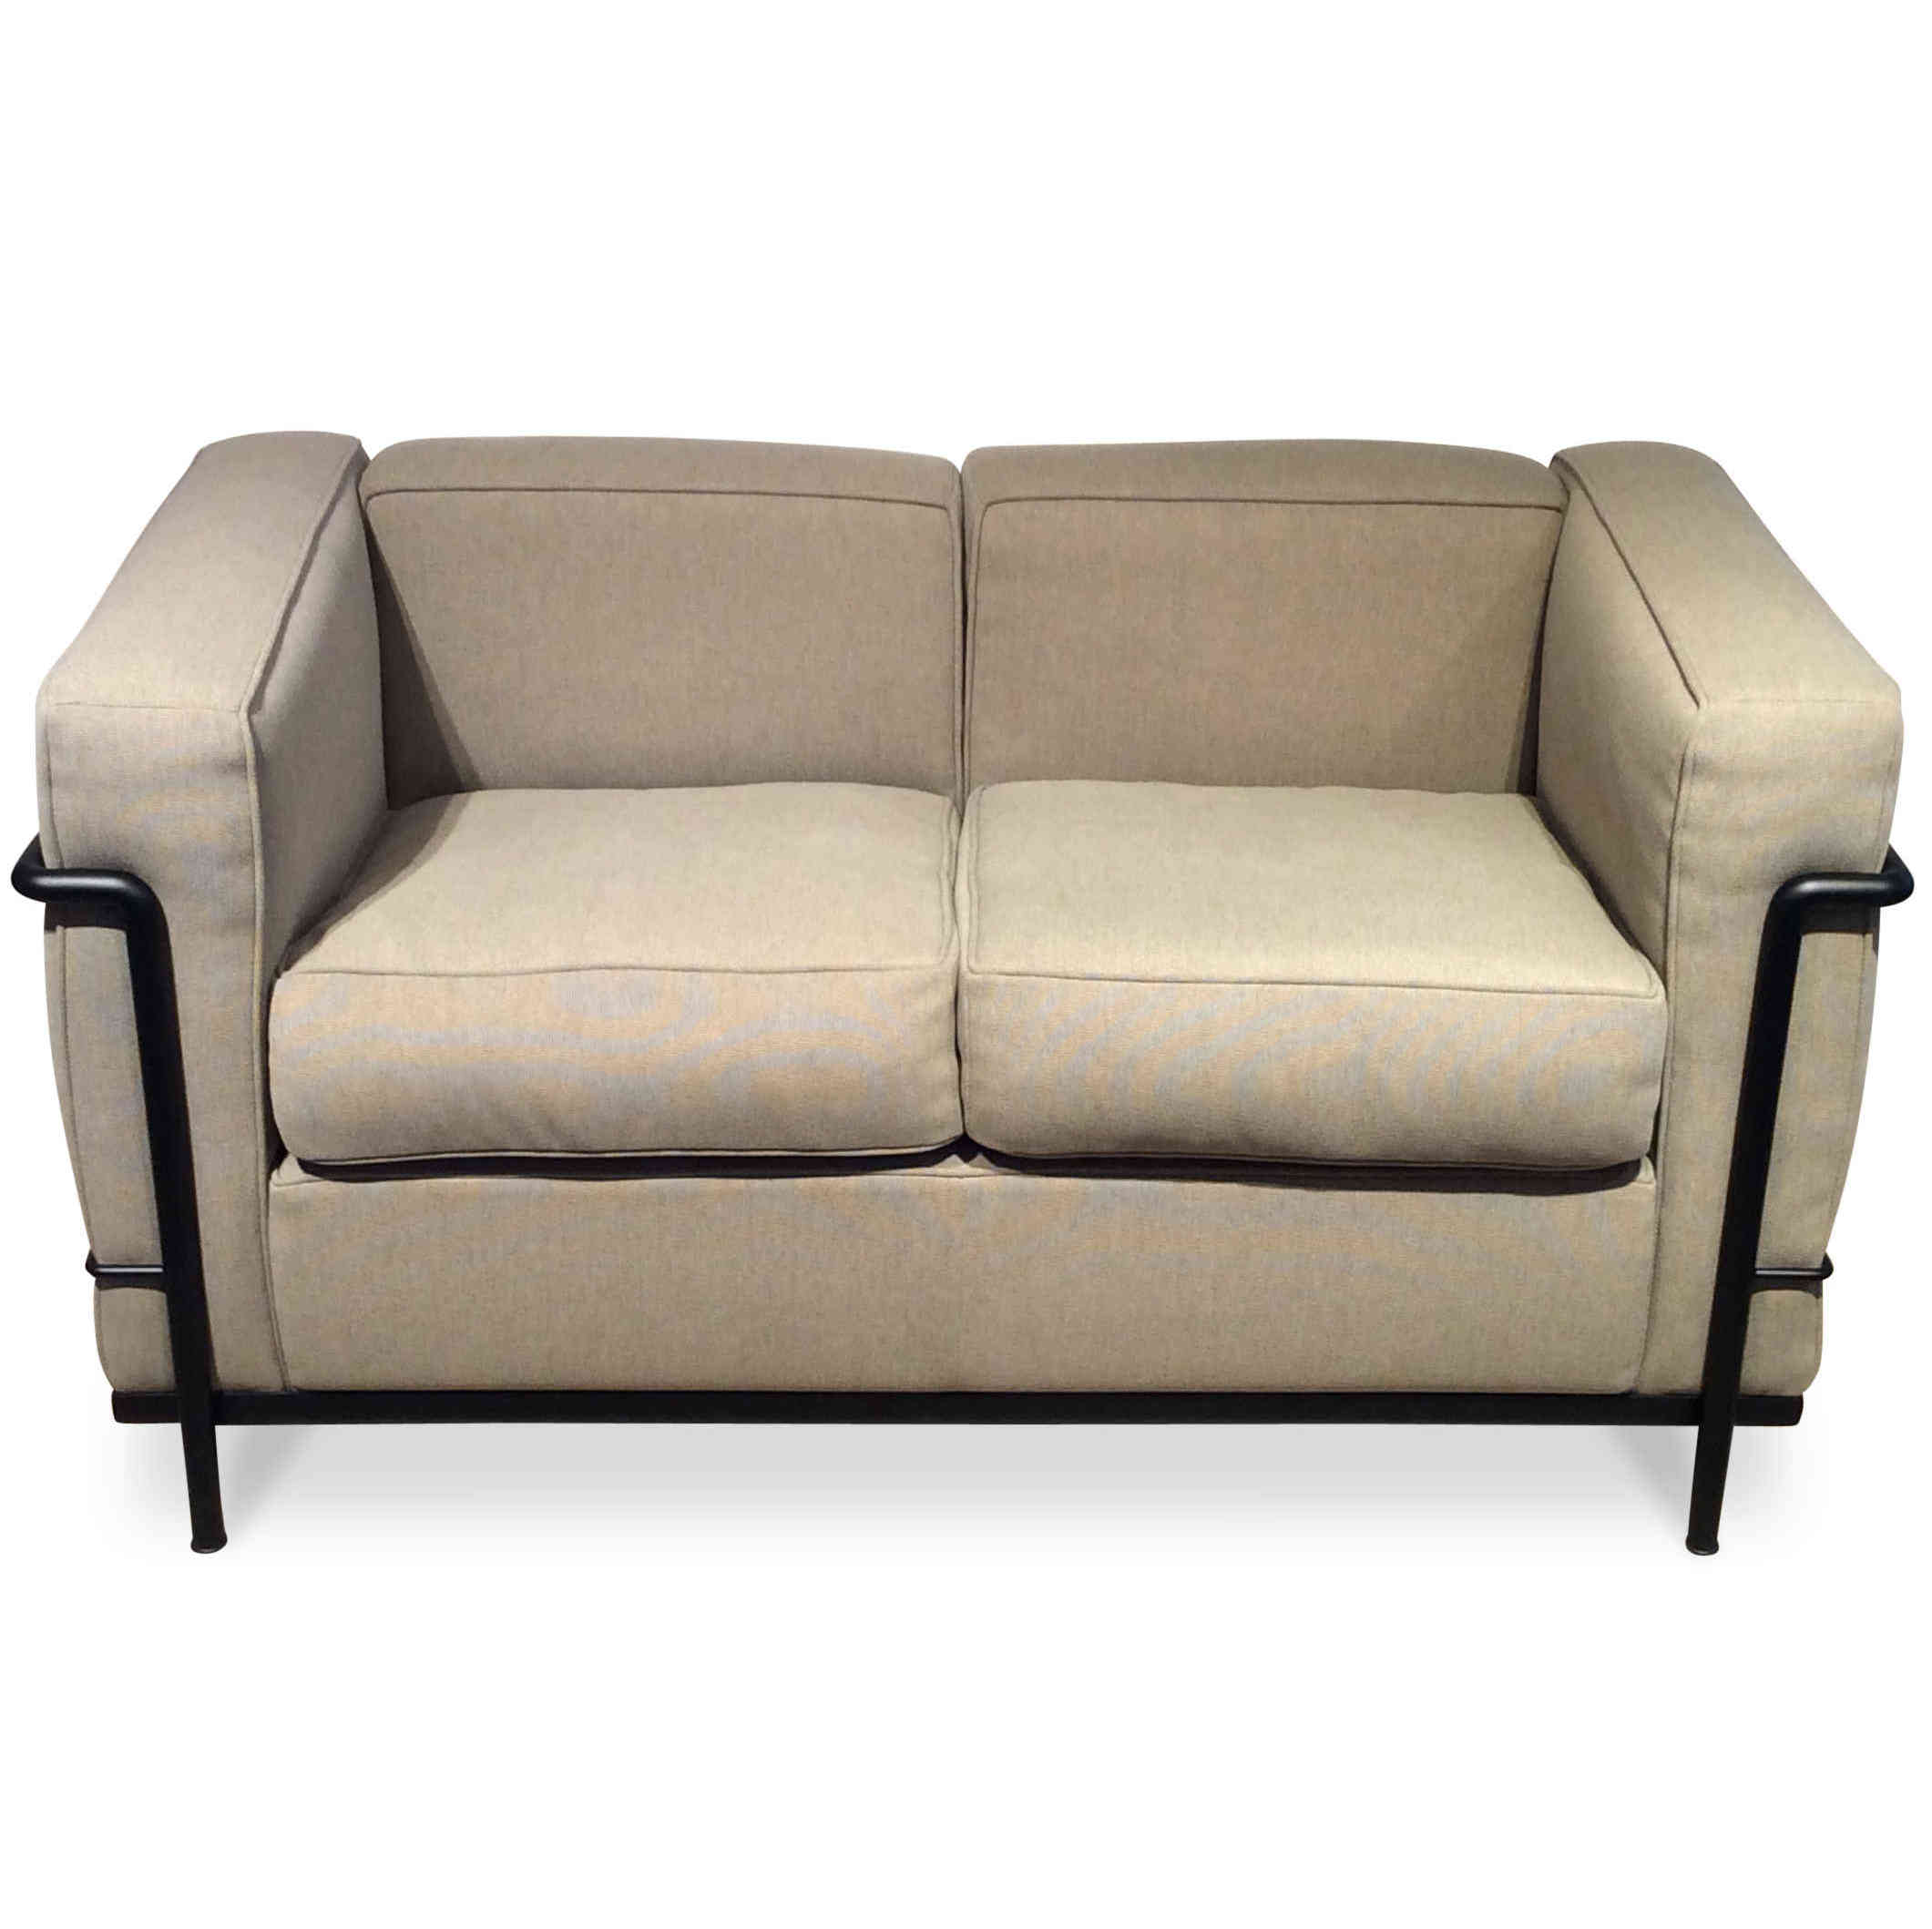 cassina designer lc2 sofa le corbusier p jeanneret c. Black Bedroom Furniture Sets. Home Design Ideas